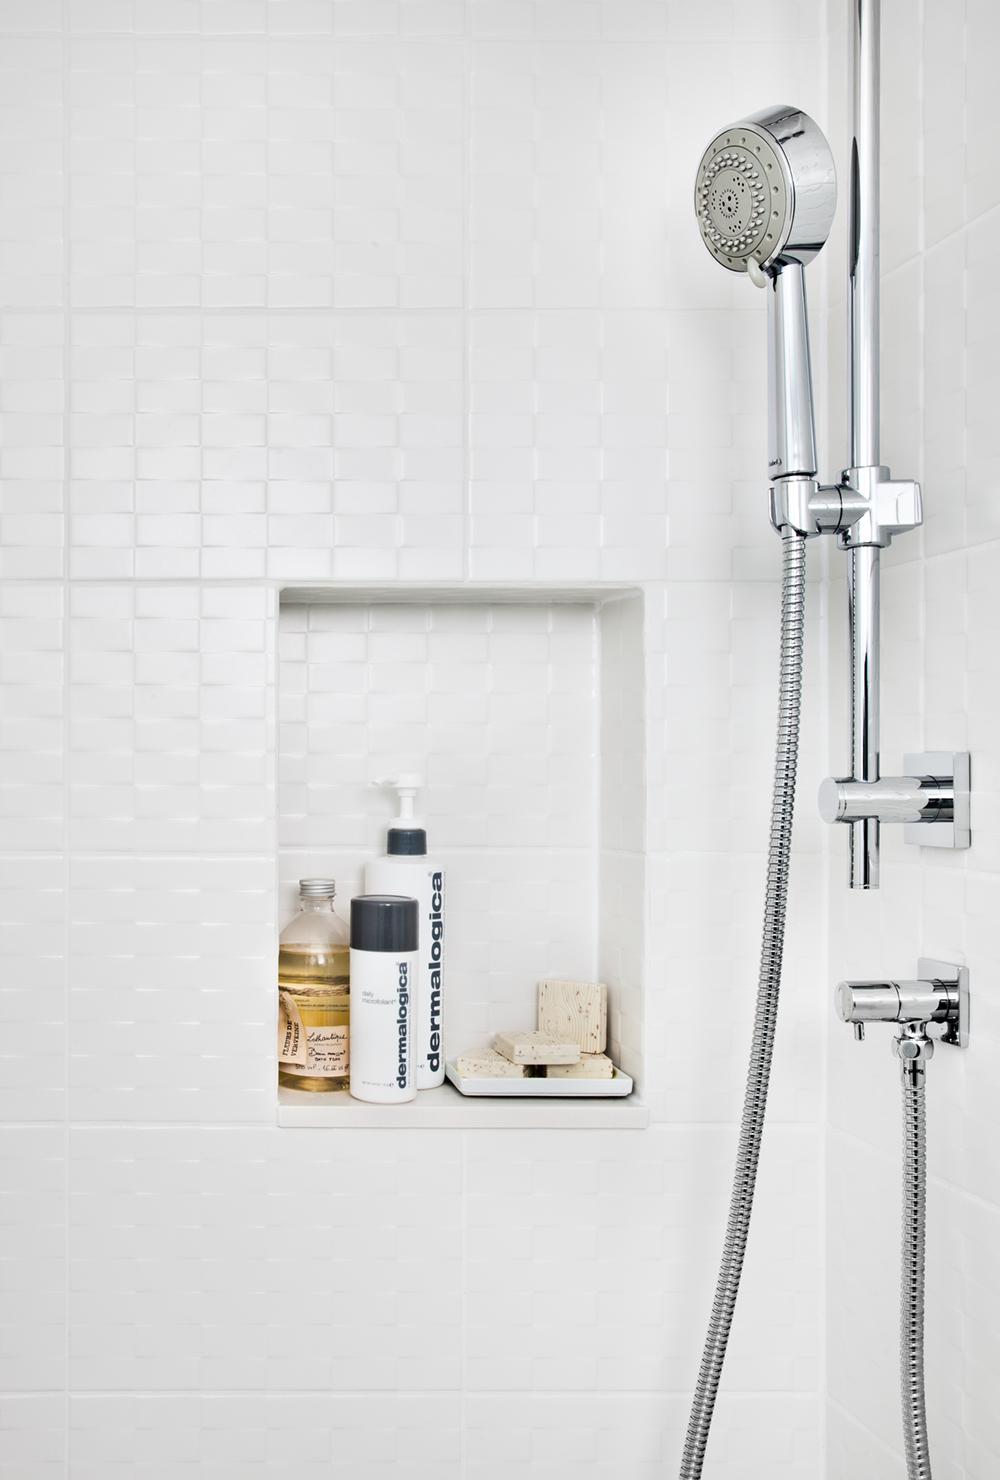 Bathroom2_detail-2_final.jpg